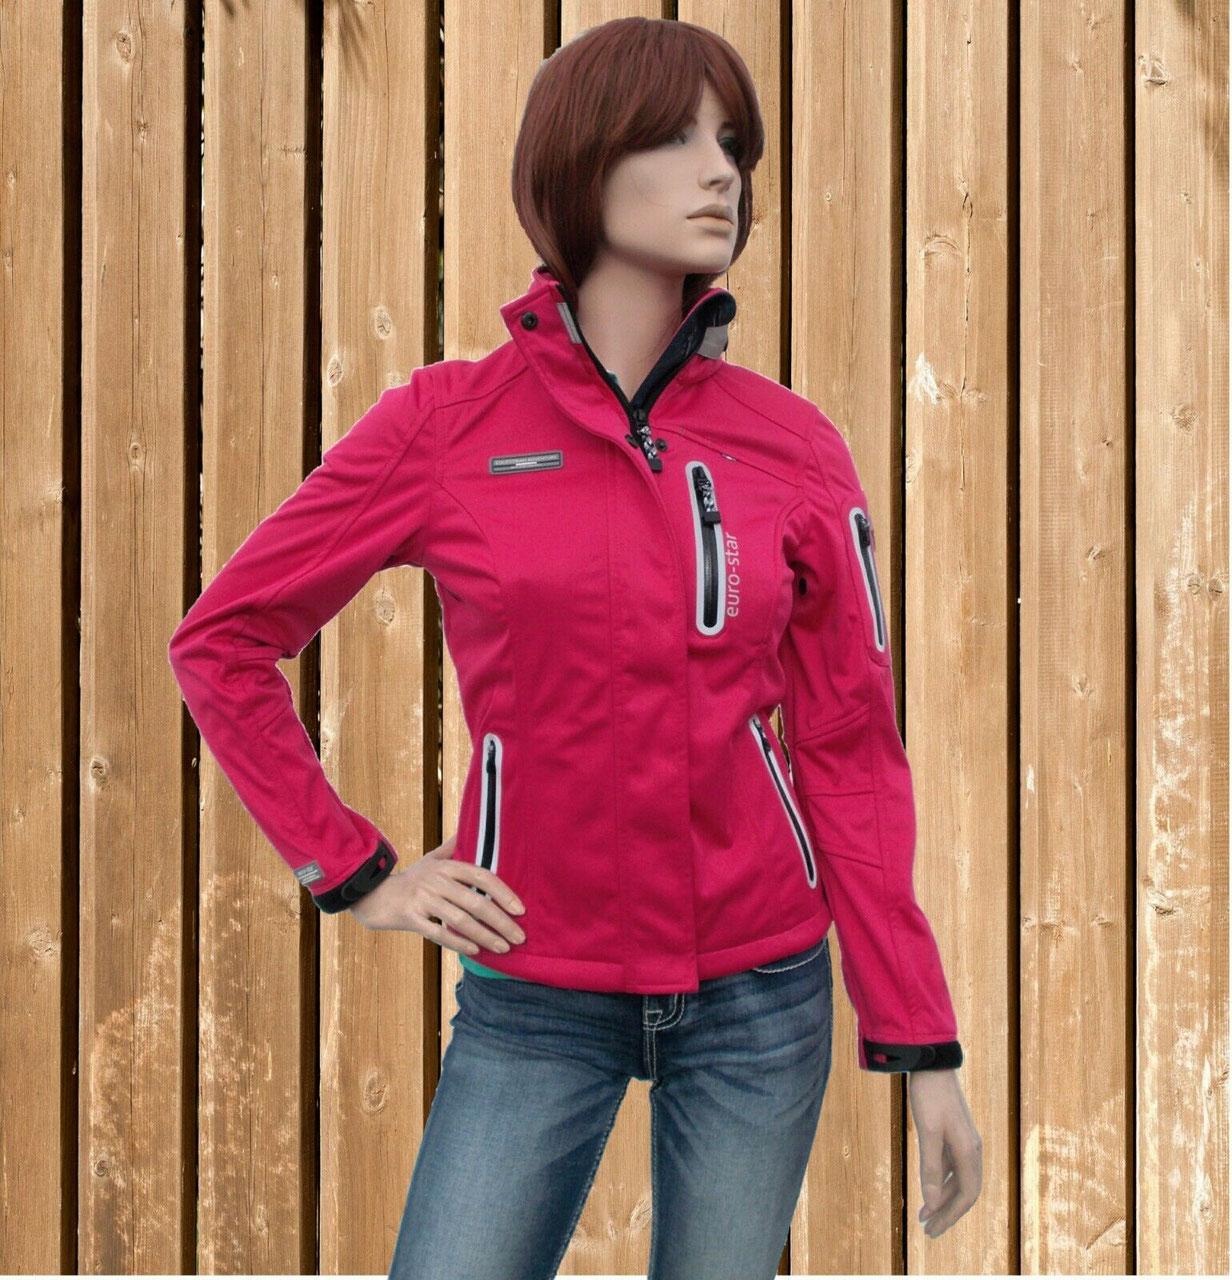 wasserdicht winddicht Softshell raspberry Euro Star Softshell Jacke Fabienne